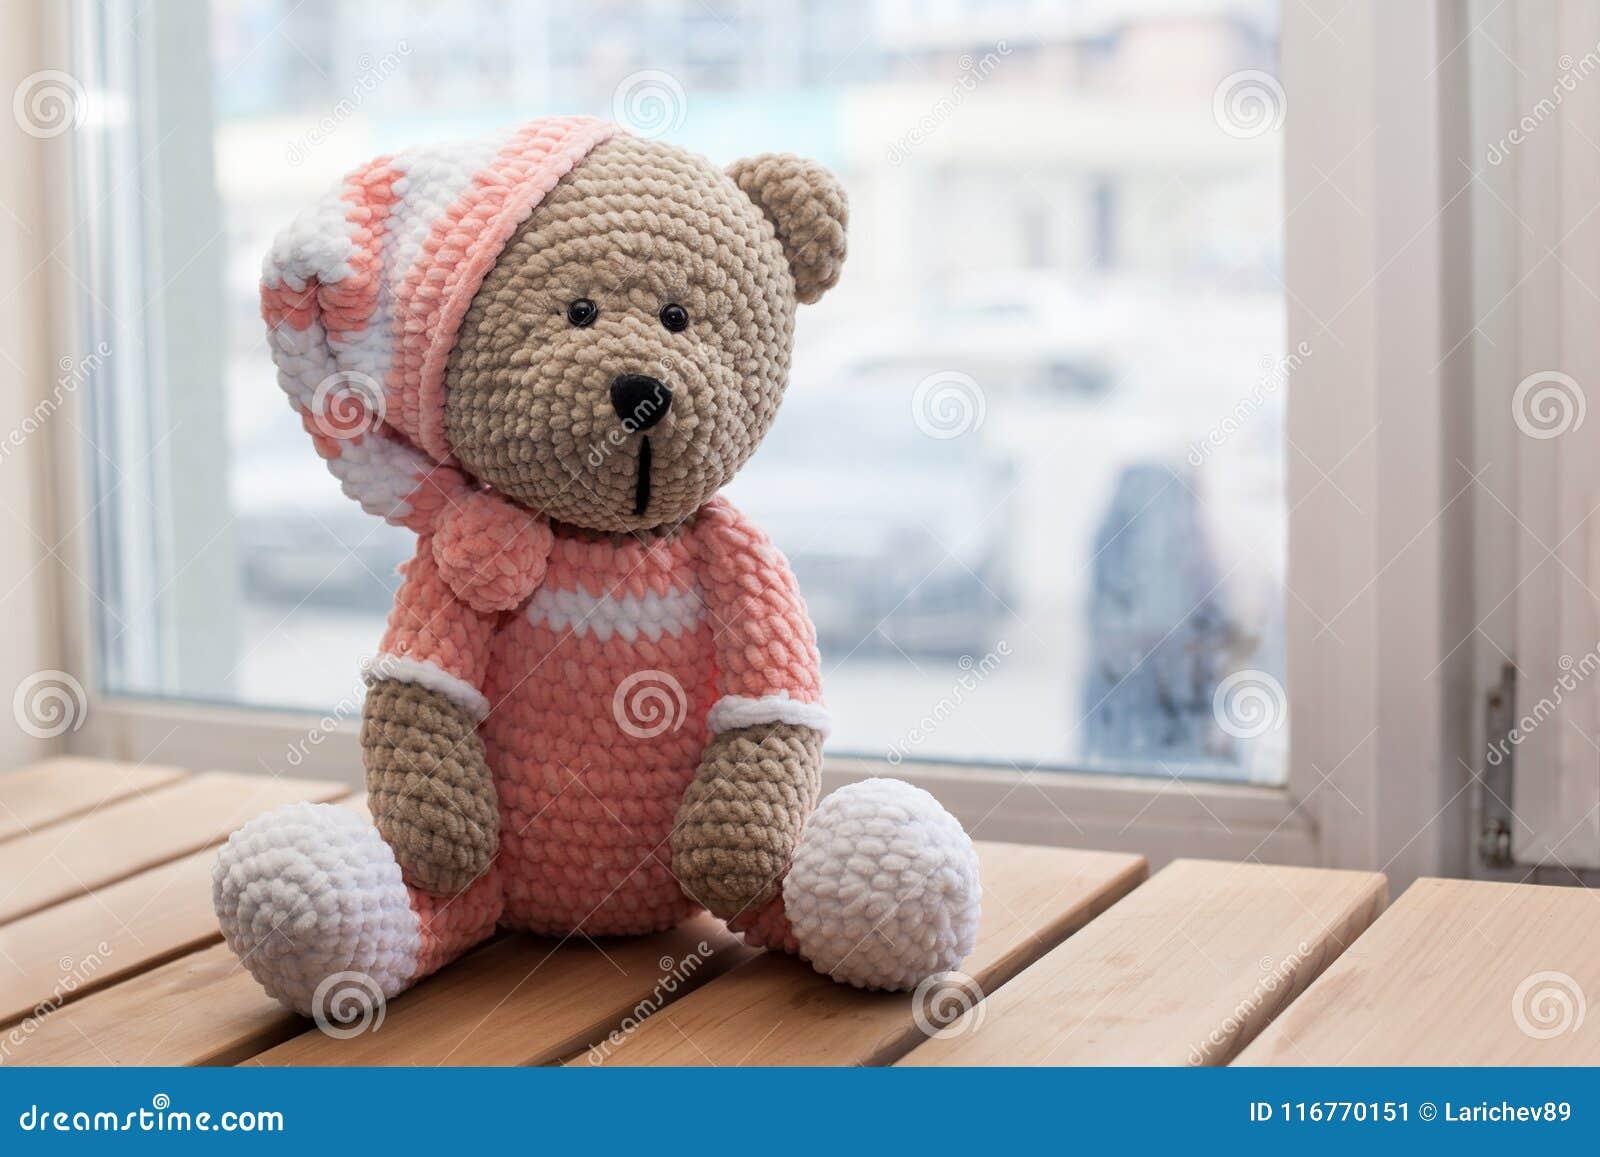 Free Amigurumi Bear Toy Softies Crochet Patterns   Crochet bear ...   957x1300